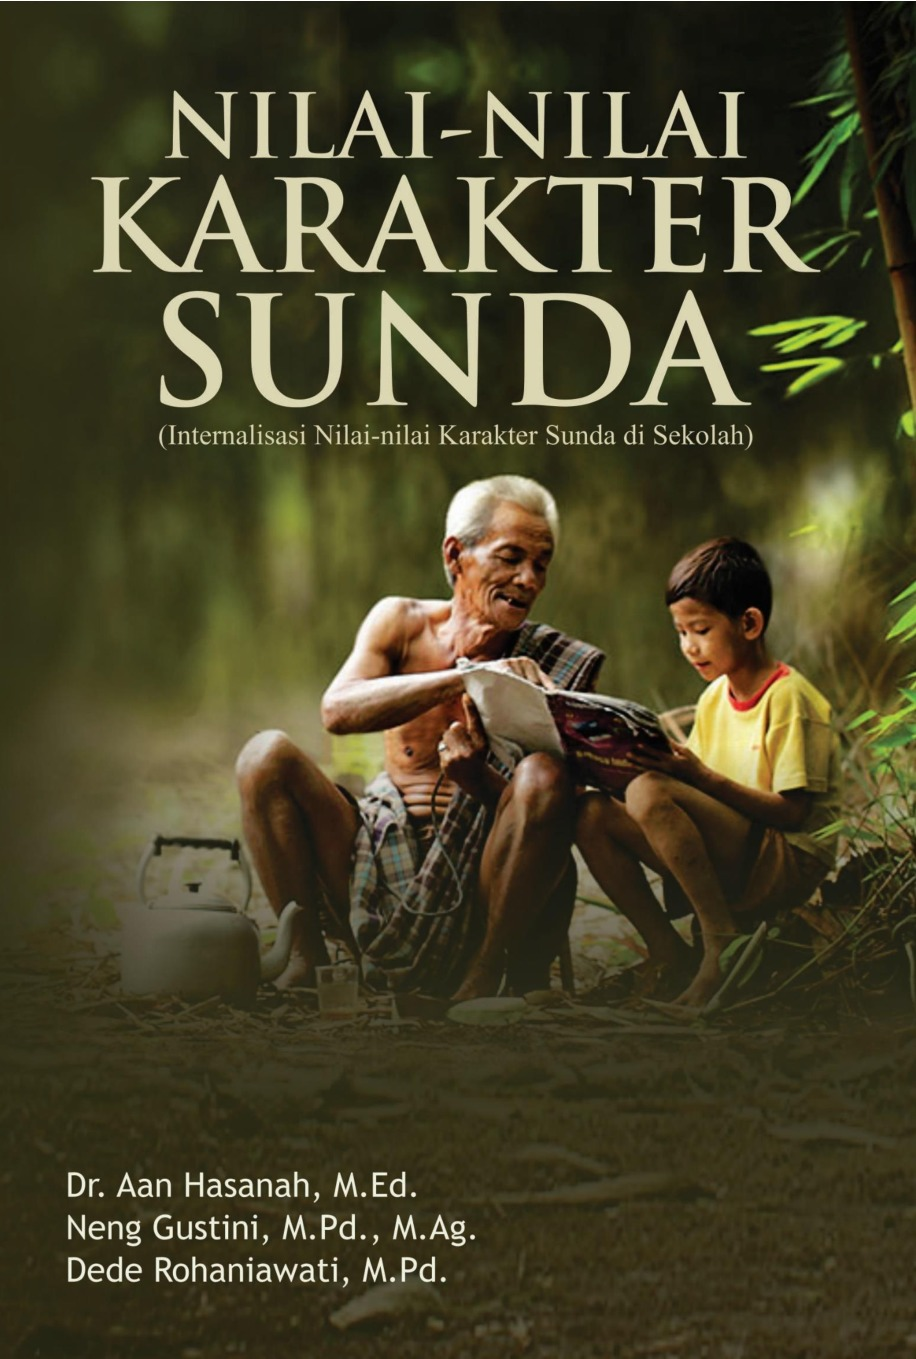 NILAI-NILAI KARAKTER SUNDA (Internalisasi Nilai-nilai Karakter Sunda di Sekolah)